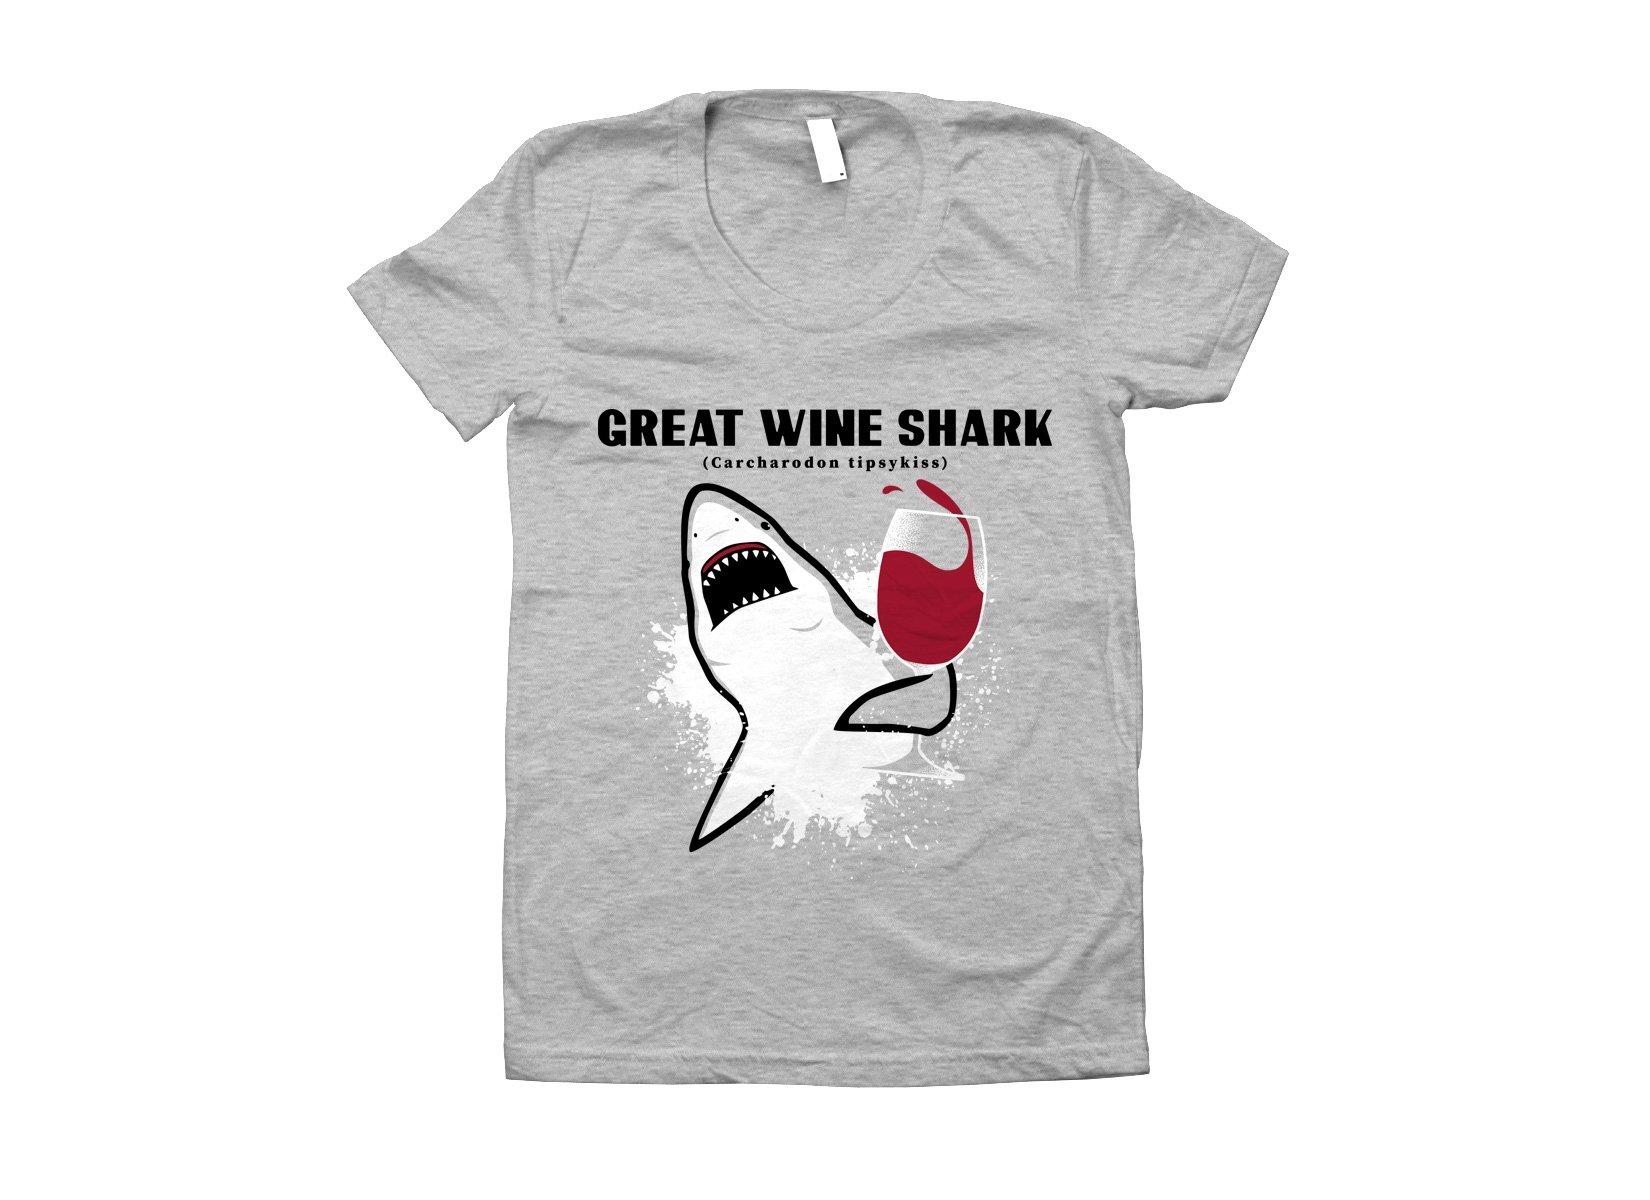 Great Wine Shark on Juniors T-Shirt